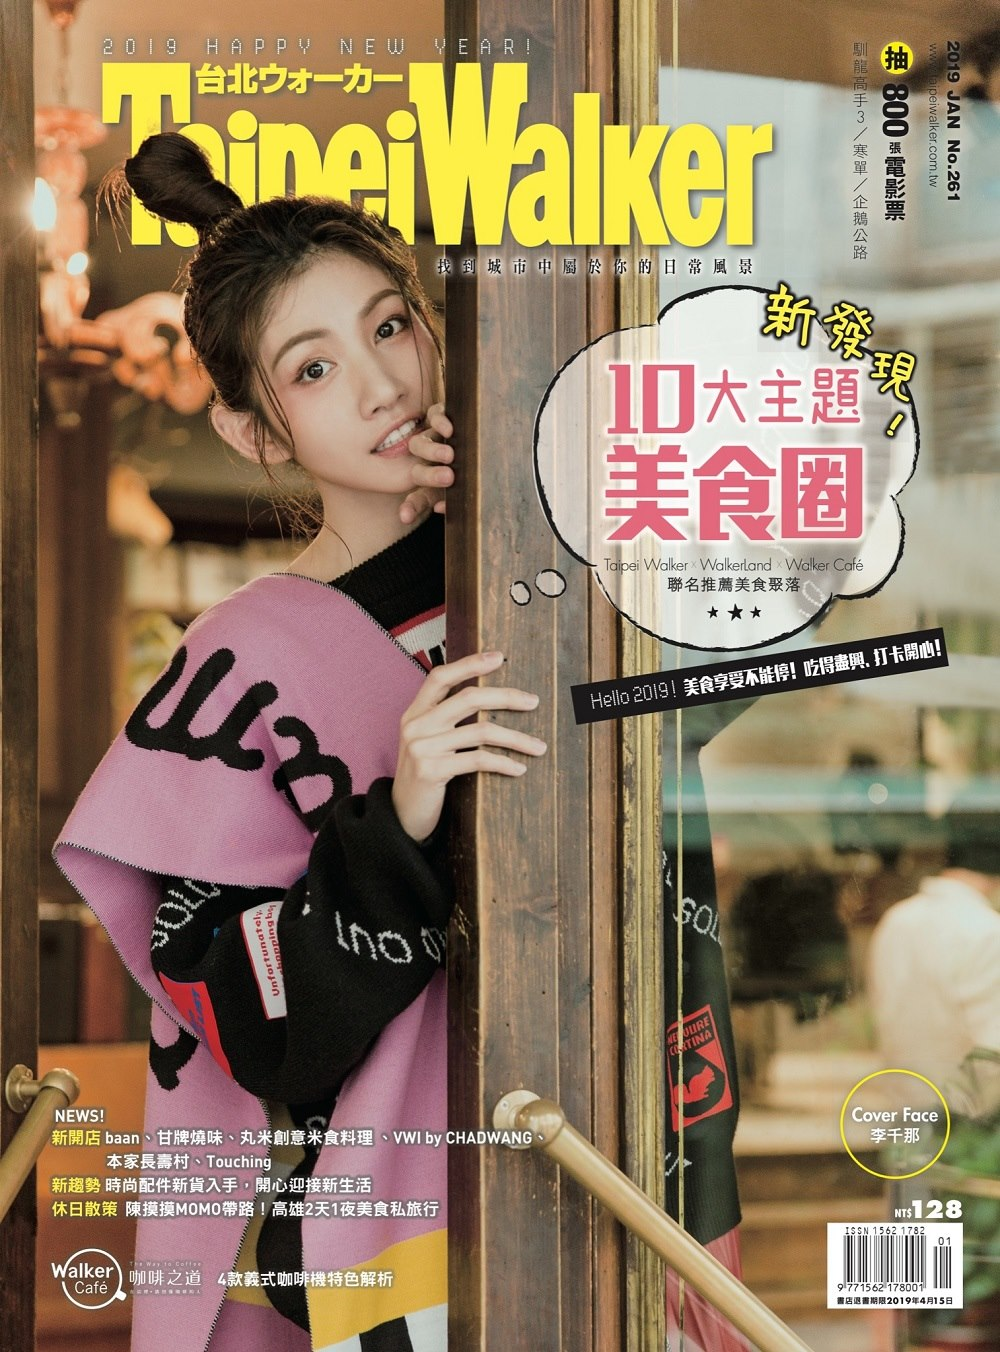 Taipei Walker 1月號/2019 第261期 贈:iphone 8 抗炫玻璃保護貼